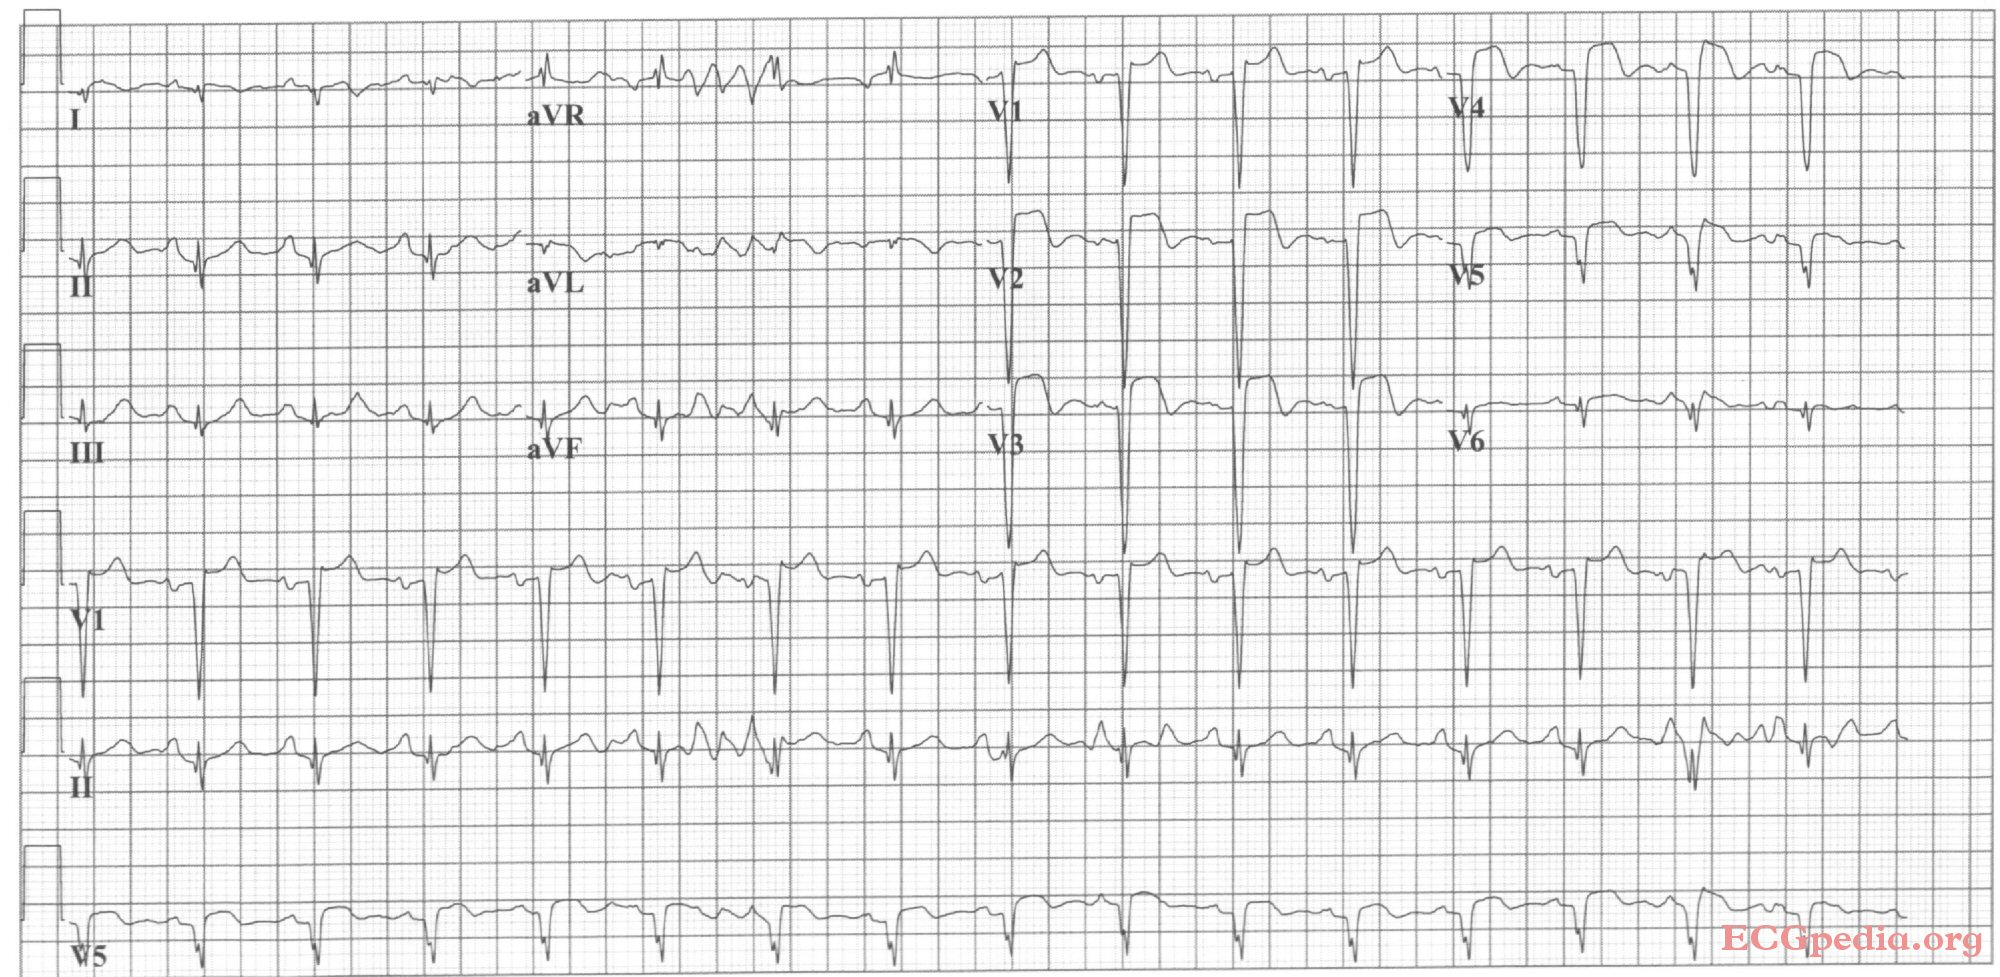 Anterior Myocardial Infarction